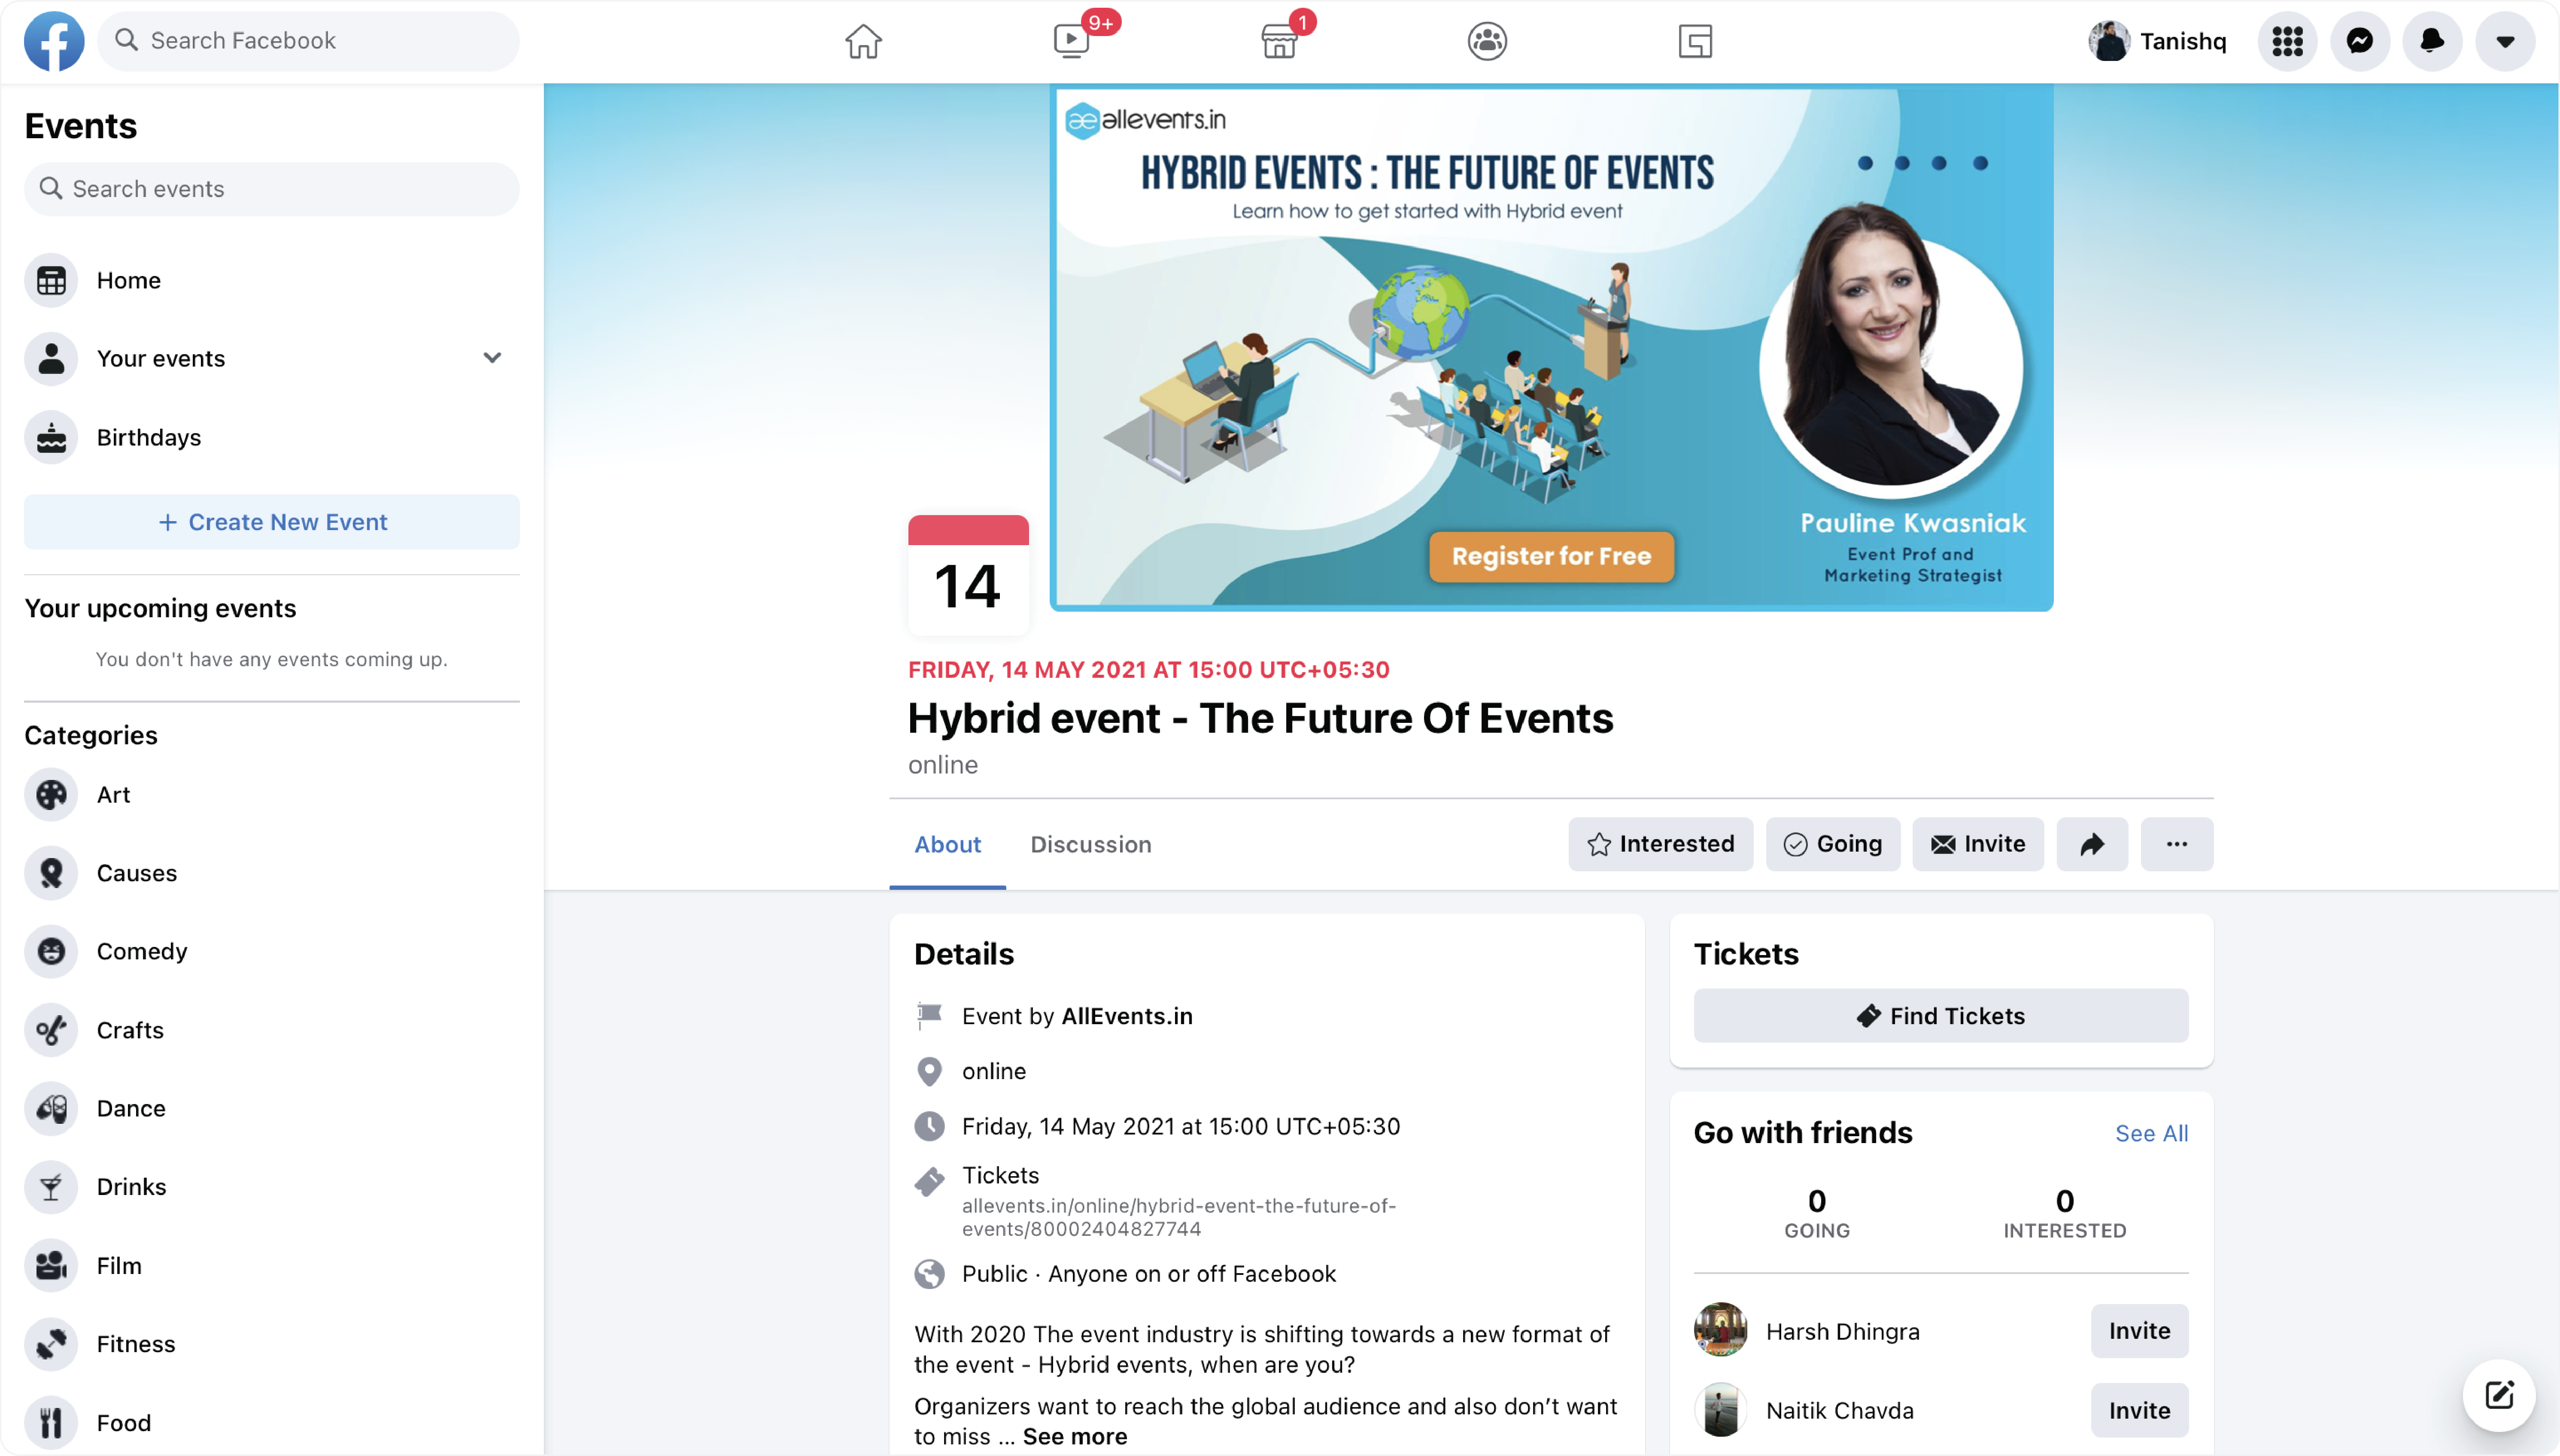 Facebook-event-find-tickets